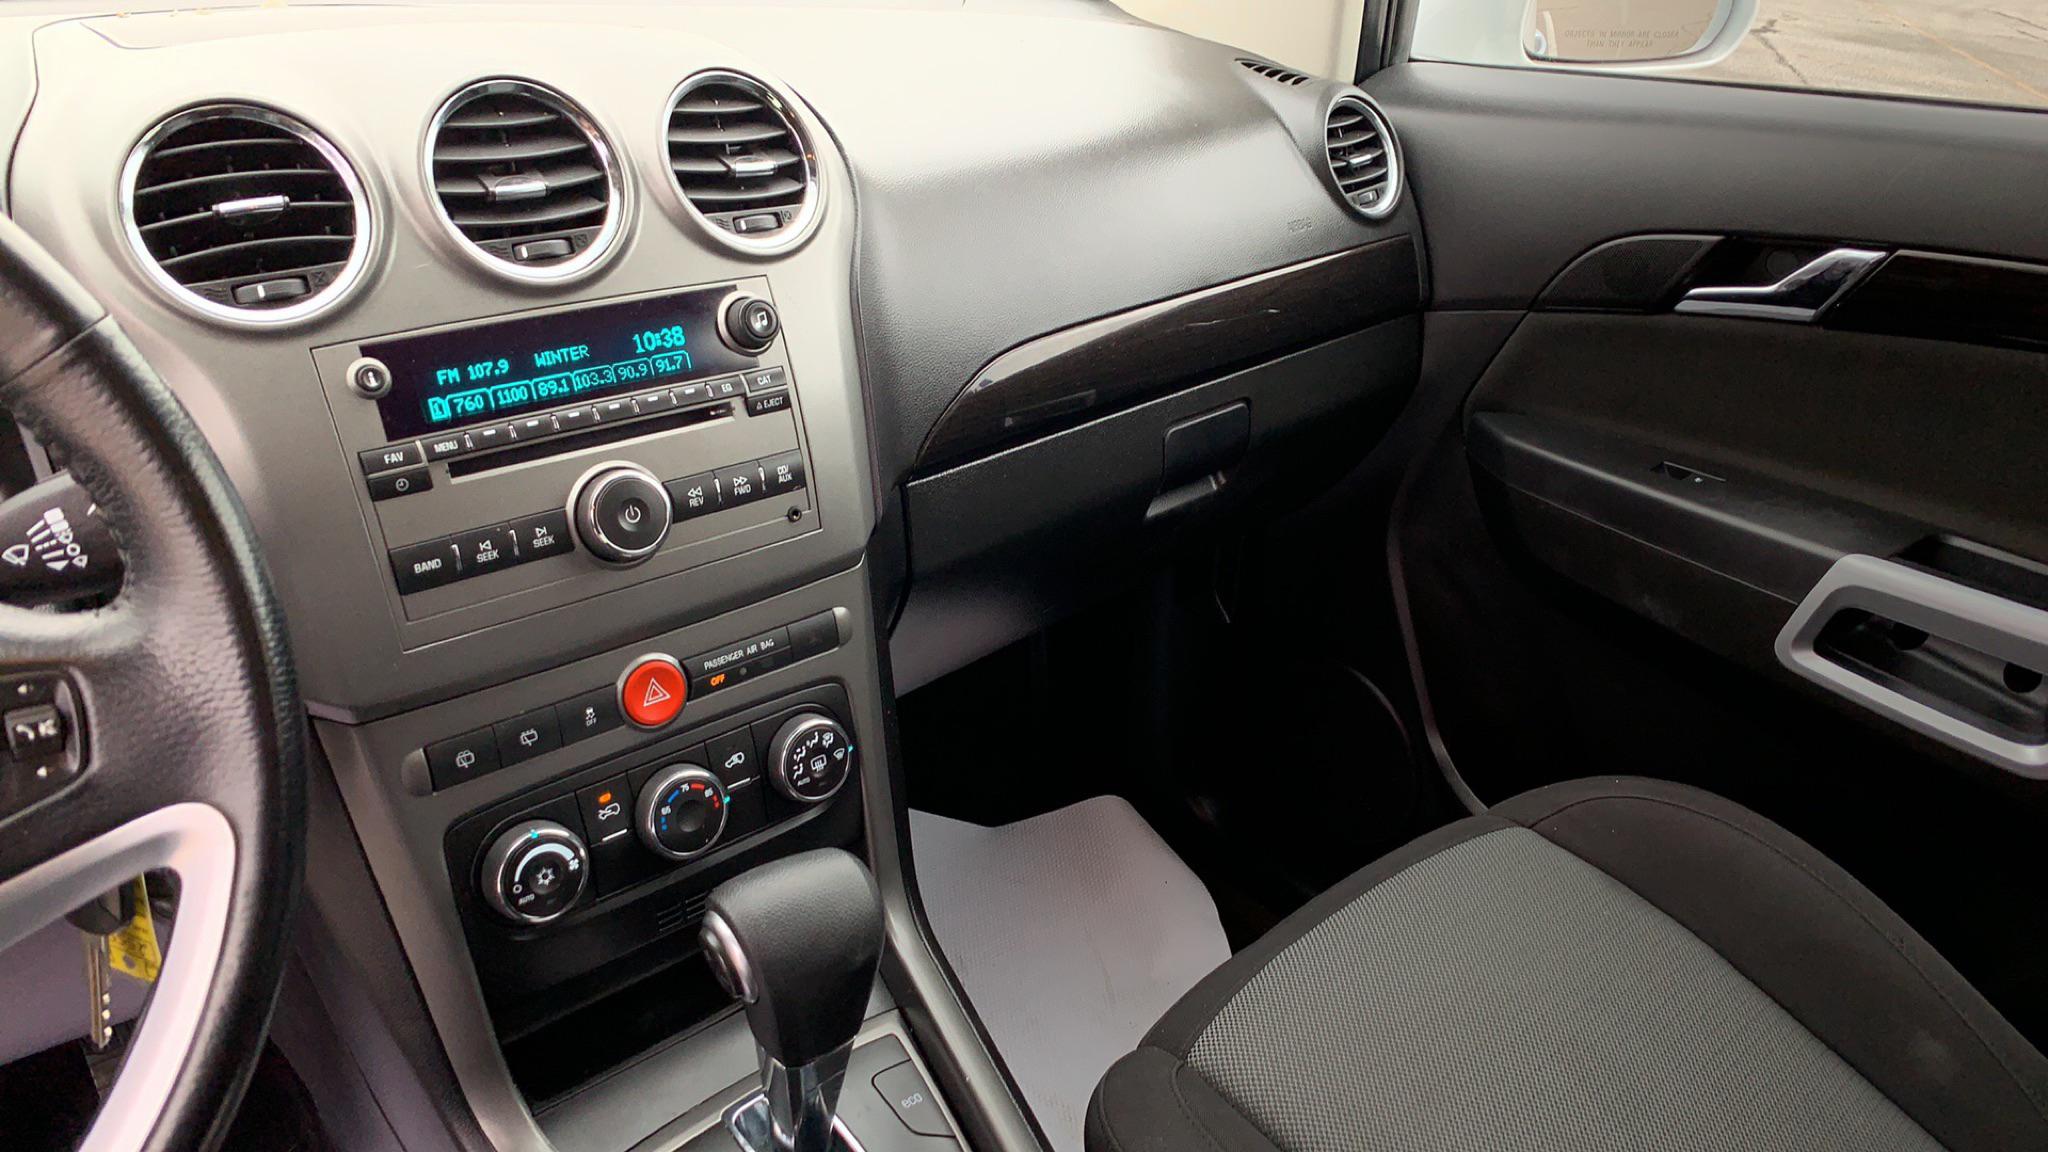 2013 CHEVROLET CAPTIVA LT for sale at TKP Auto Sales